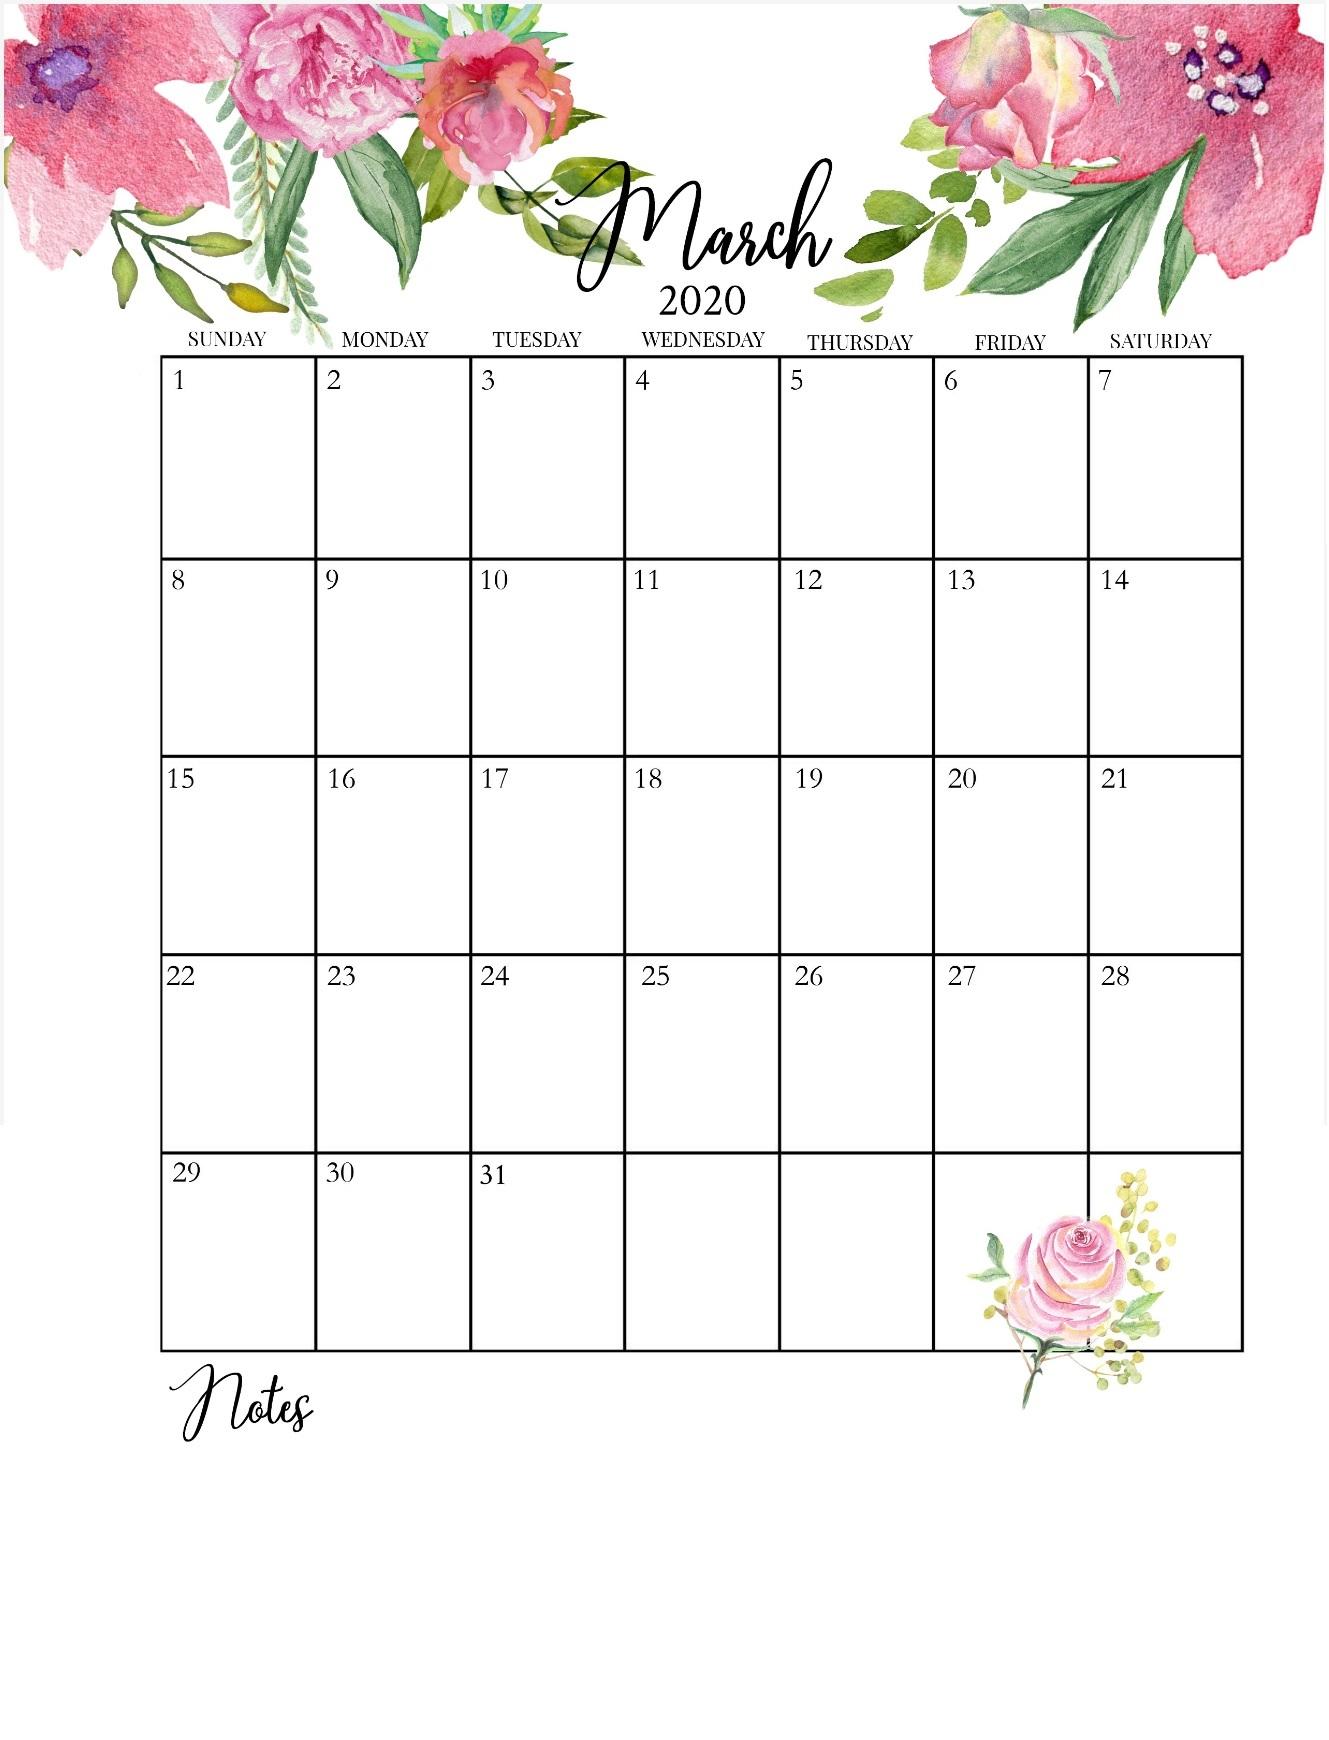 Latest March 2020 Floral Calendar